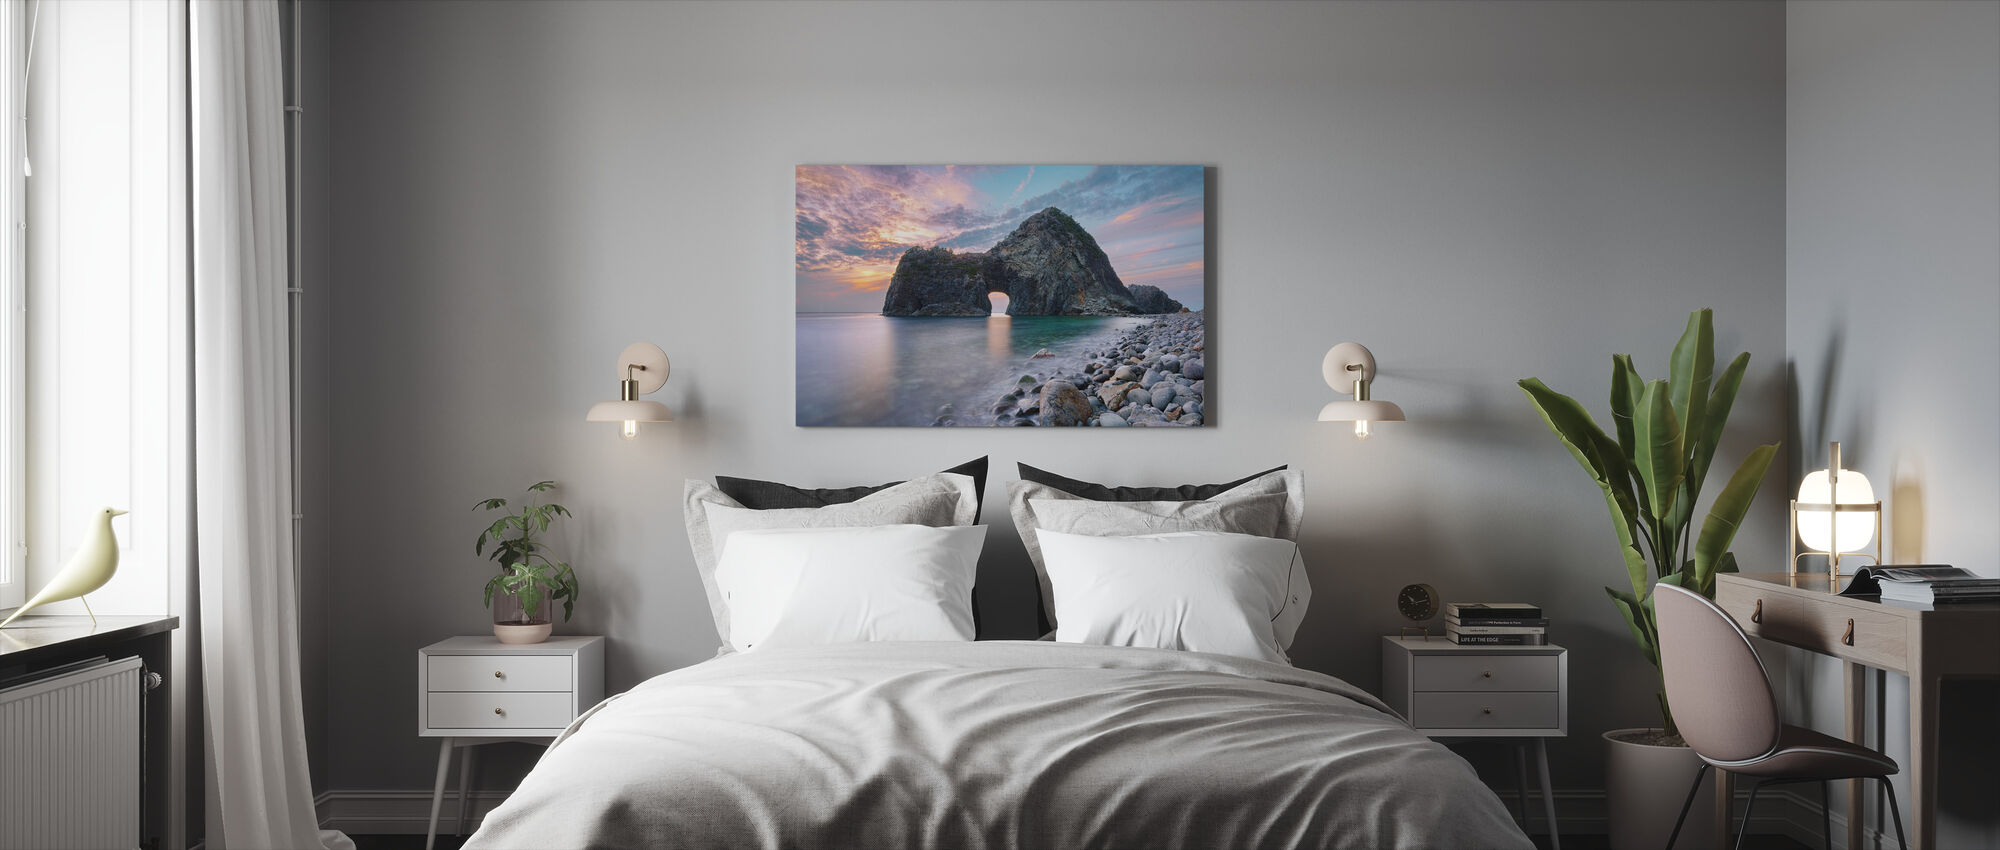 Rock Gate Senganmon - Canvas print - Bedroom